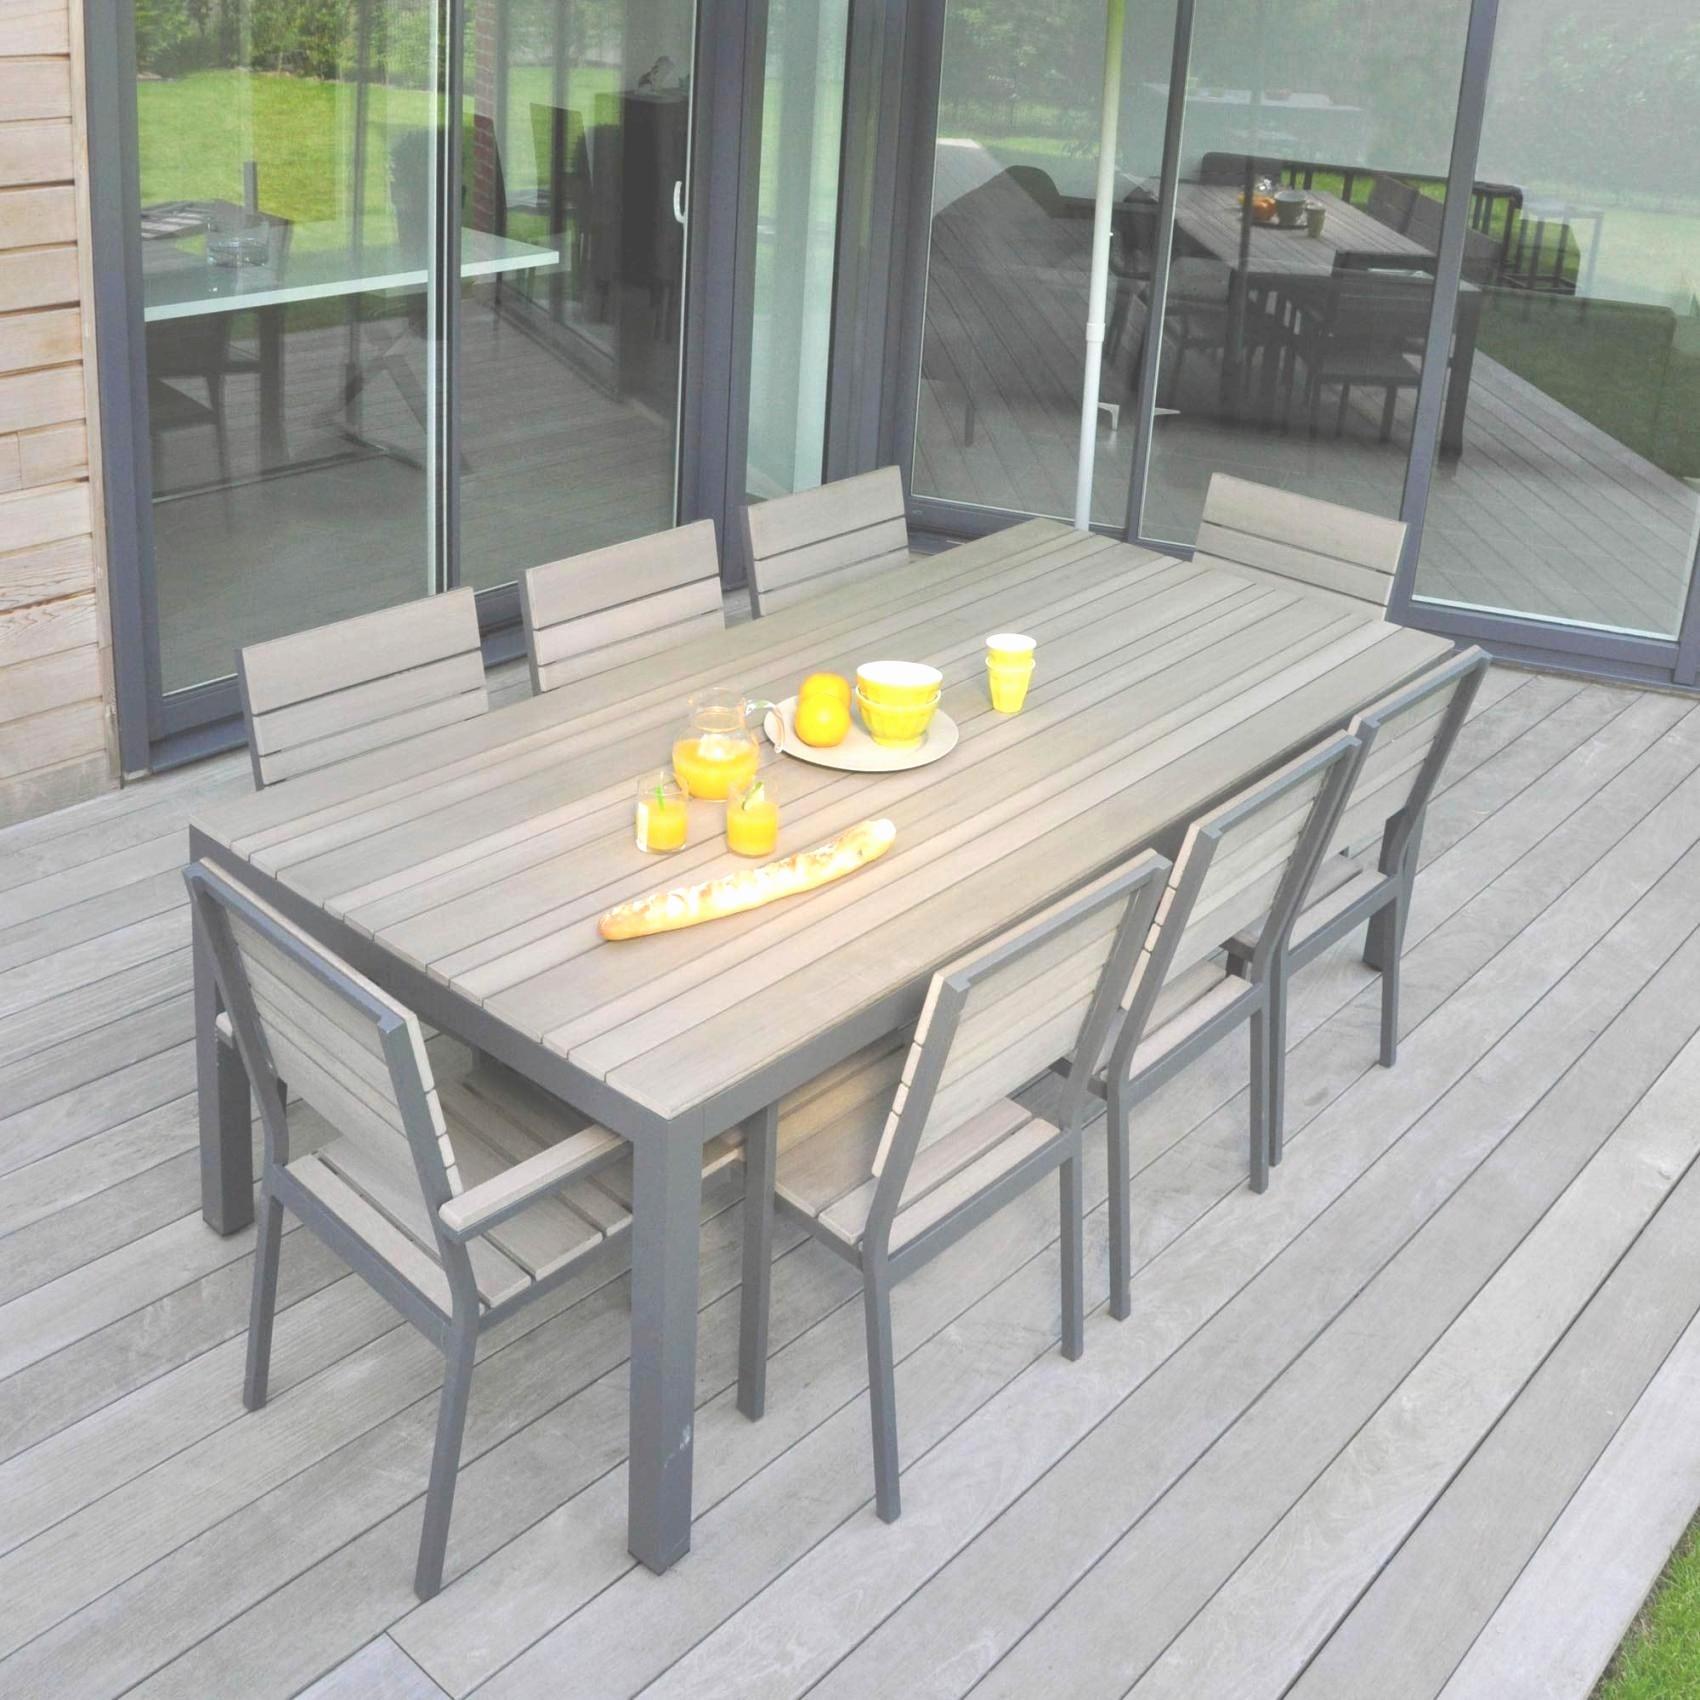 Table Kettler solde Frais Photos Table De Jardin Kettler Aussi Vieux Beautiful Table De Salon De